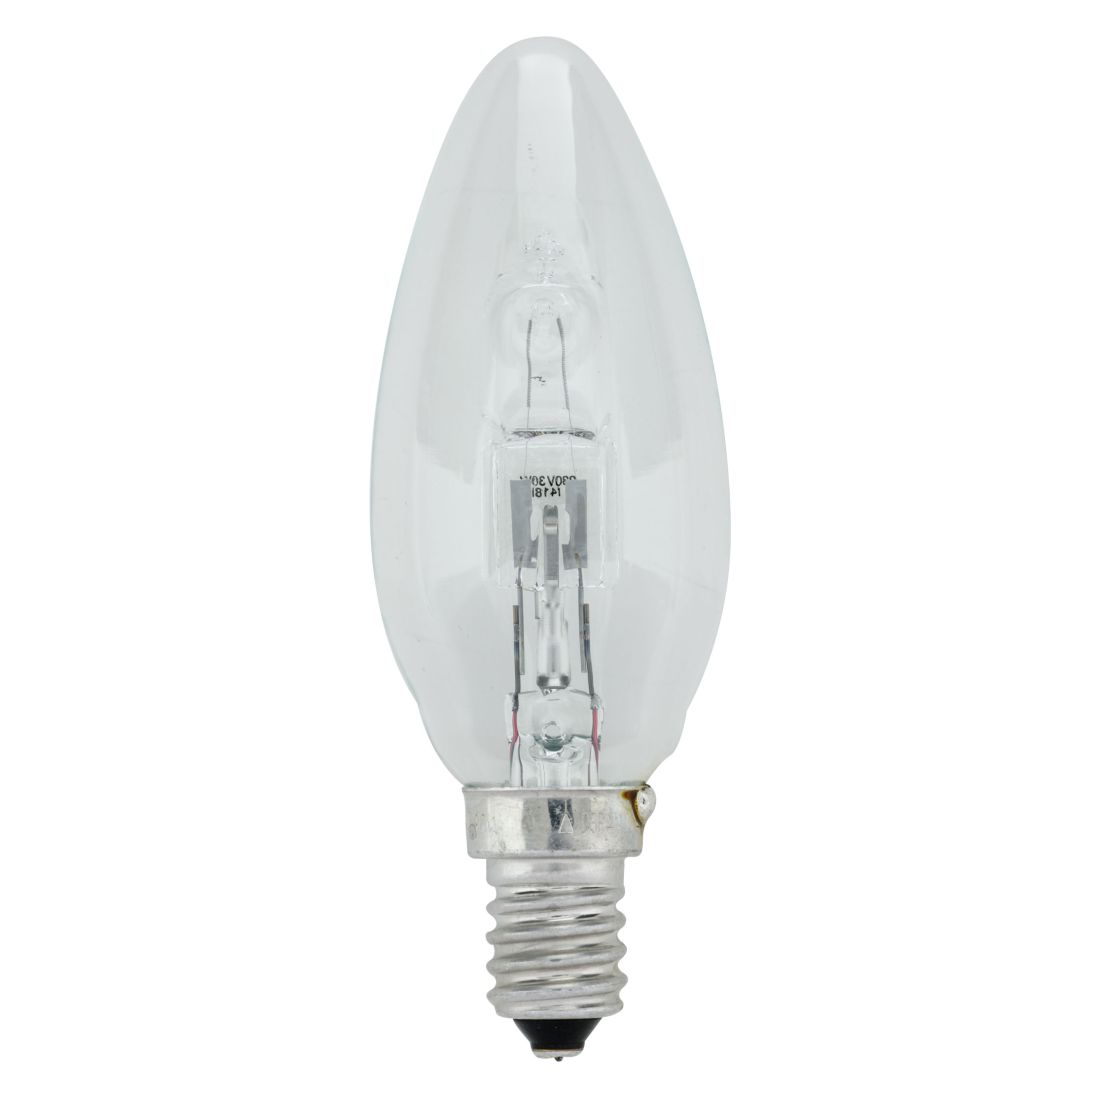 Halogen-Retrofitlampe E14 28 W Kerze klar ● Glas Klar- Mega Licht